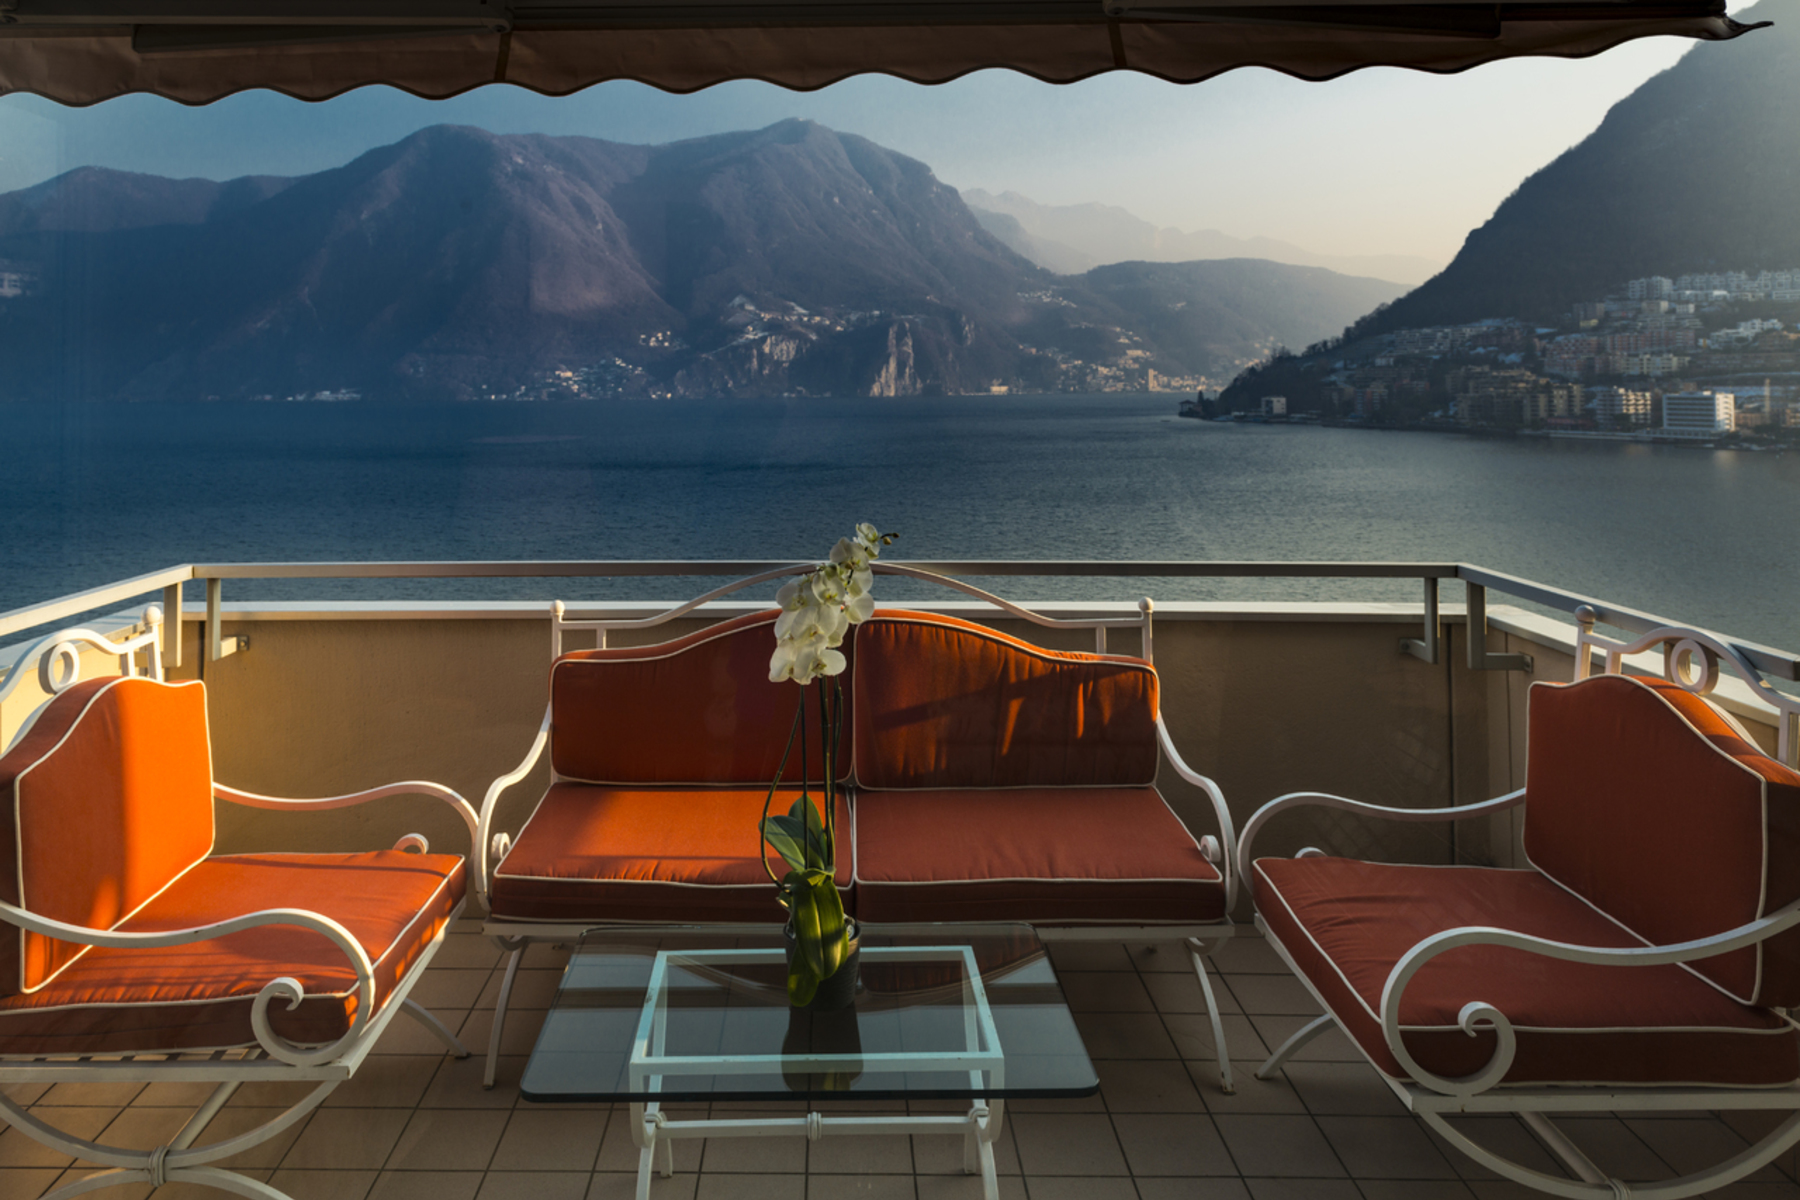 Apartment for Sale at Lakefront penthouse Lugano, Lugano, Ticino, 6900 Switzerland